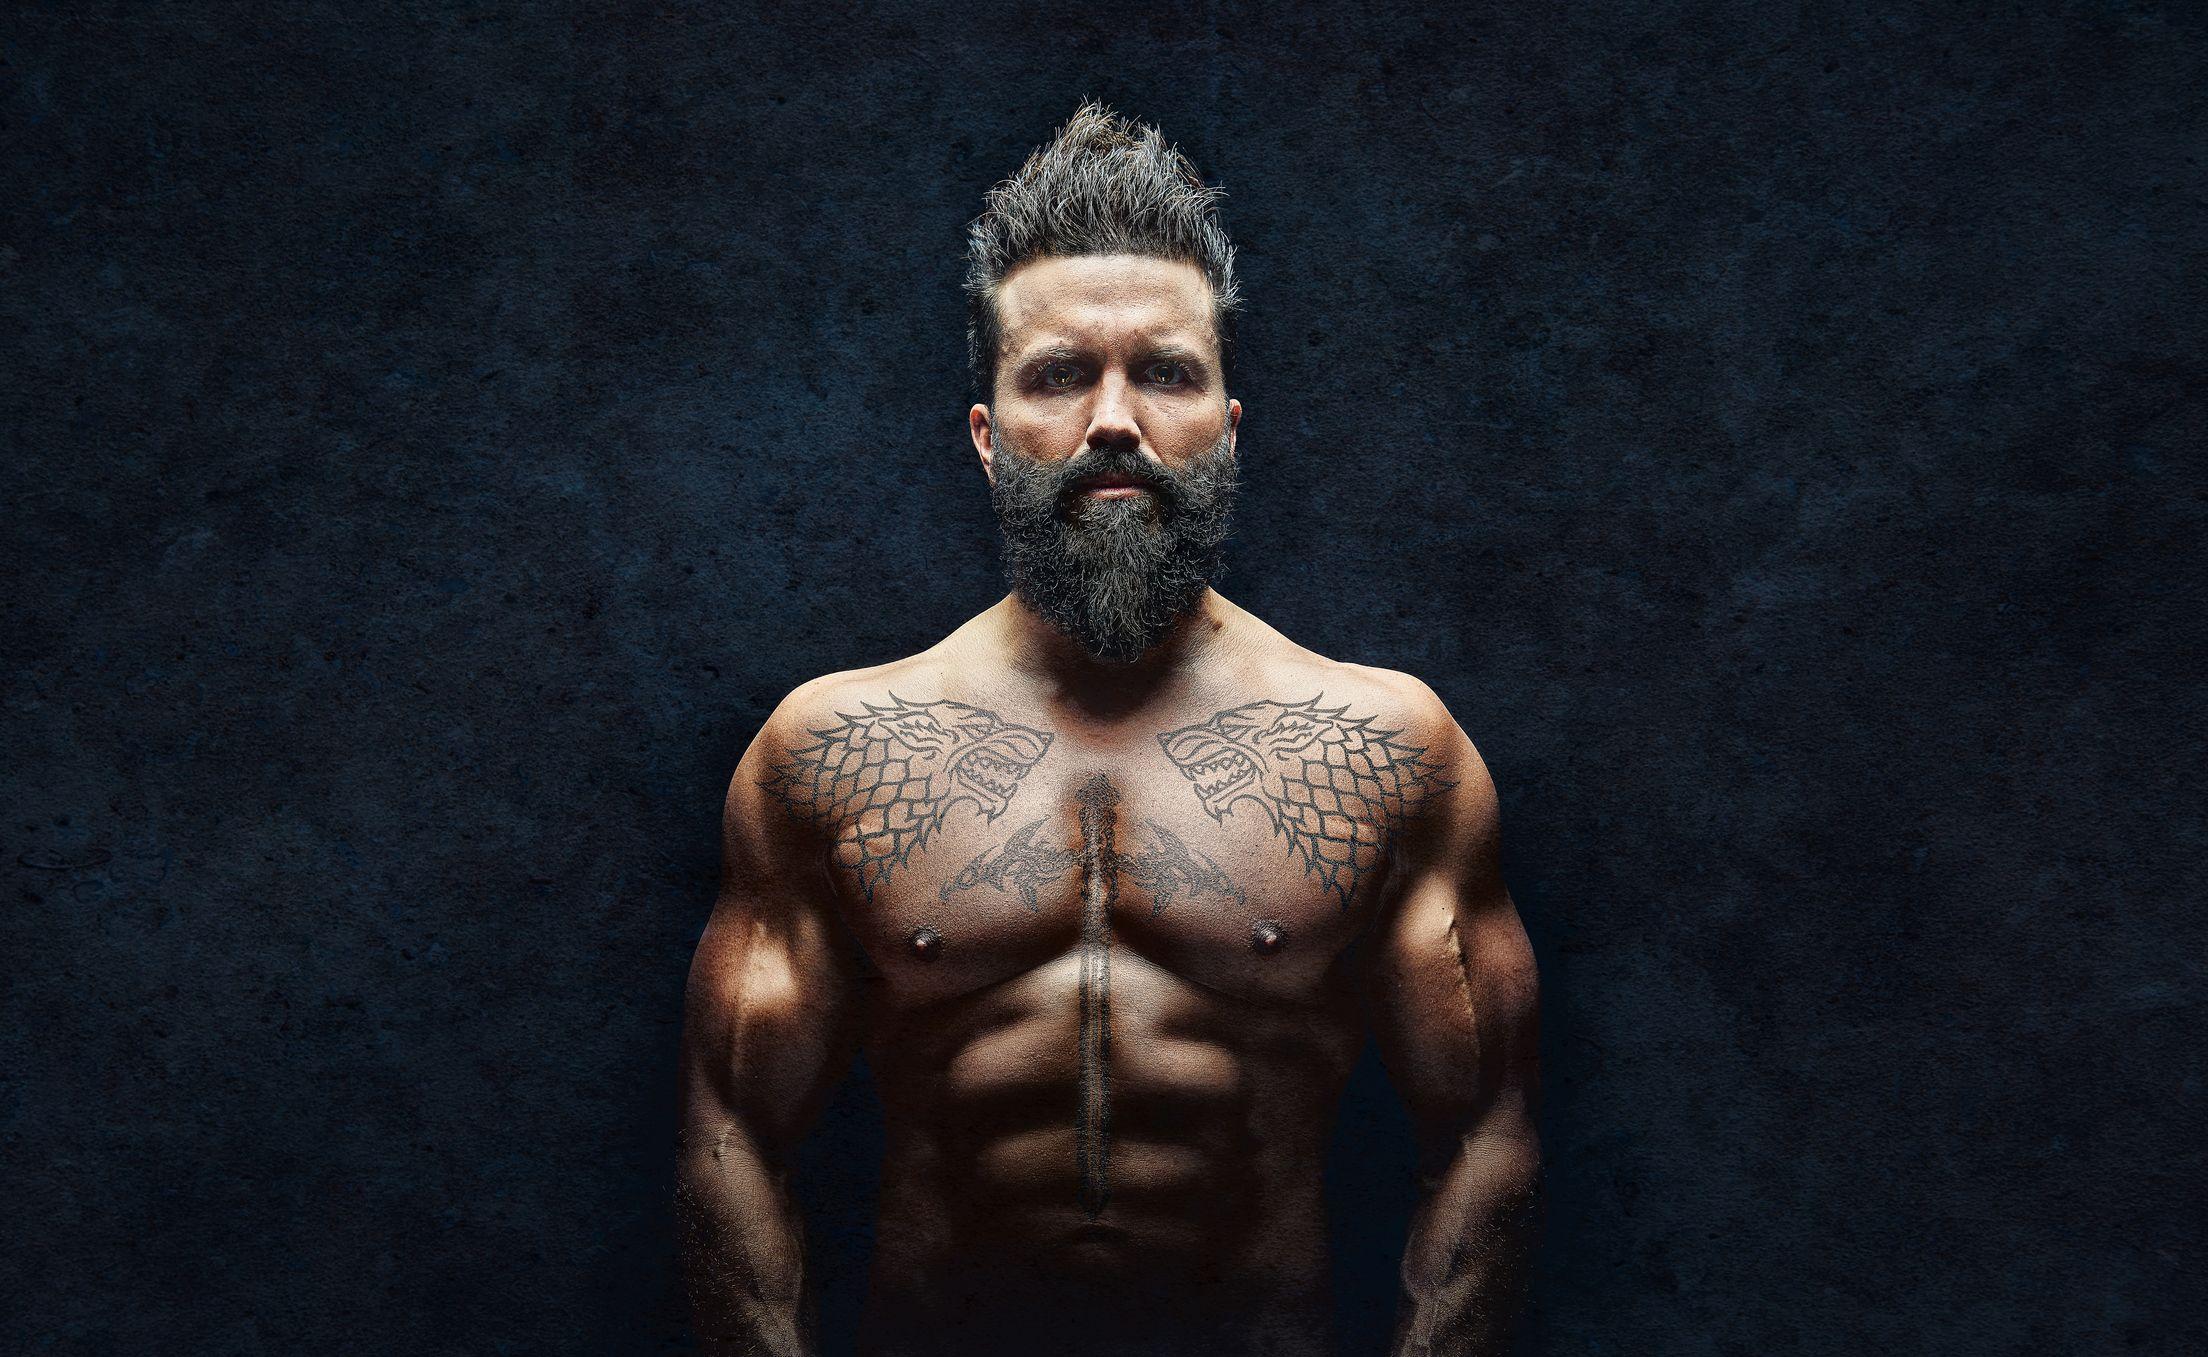 Free tattoo dating uk www best dating